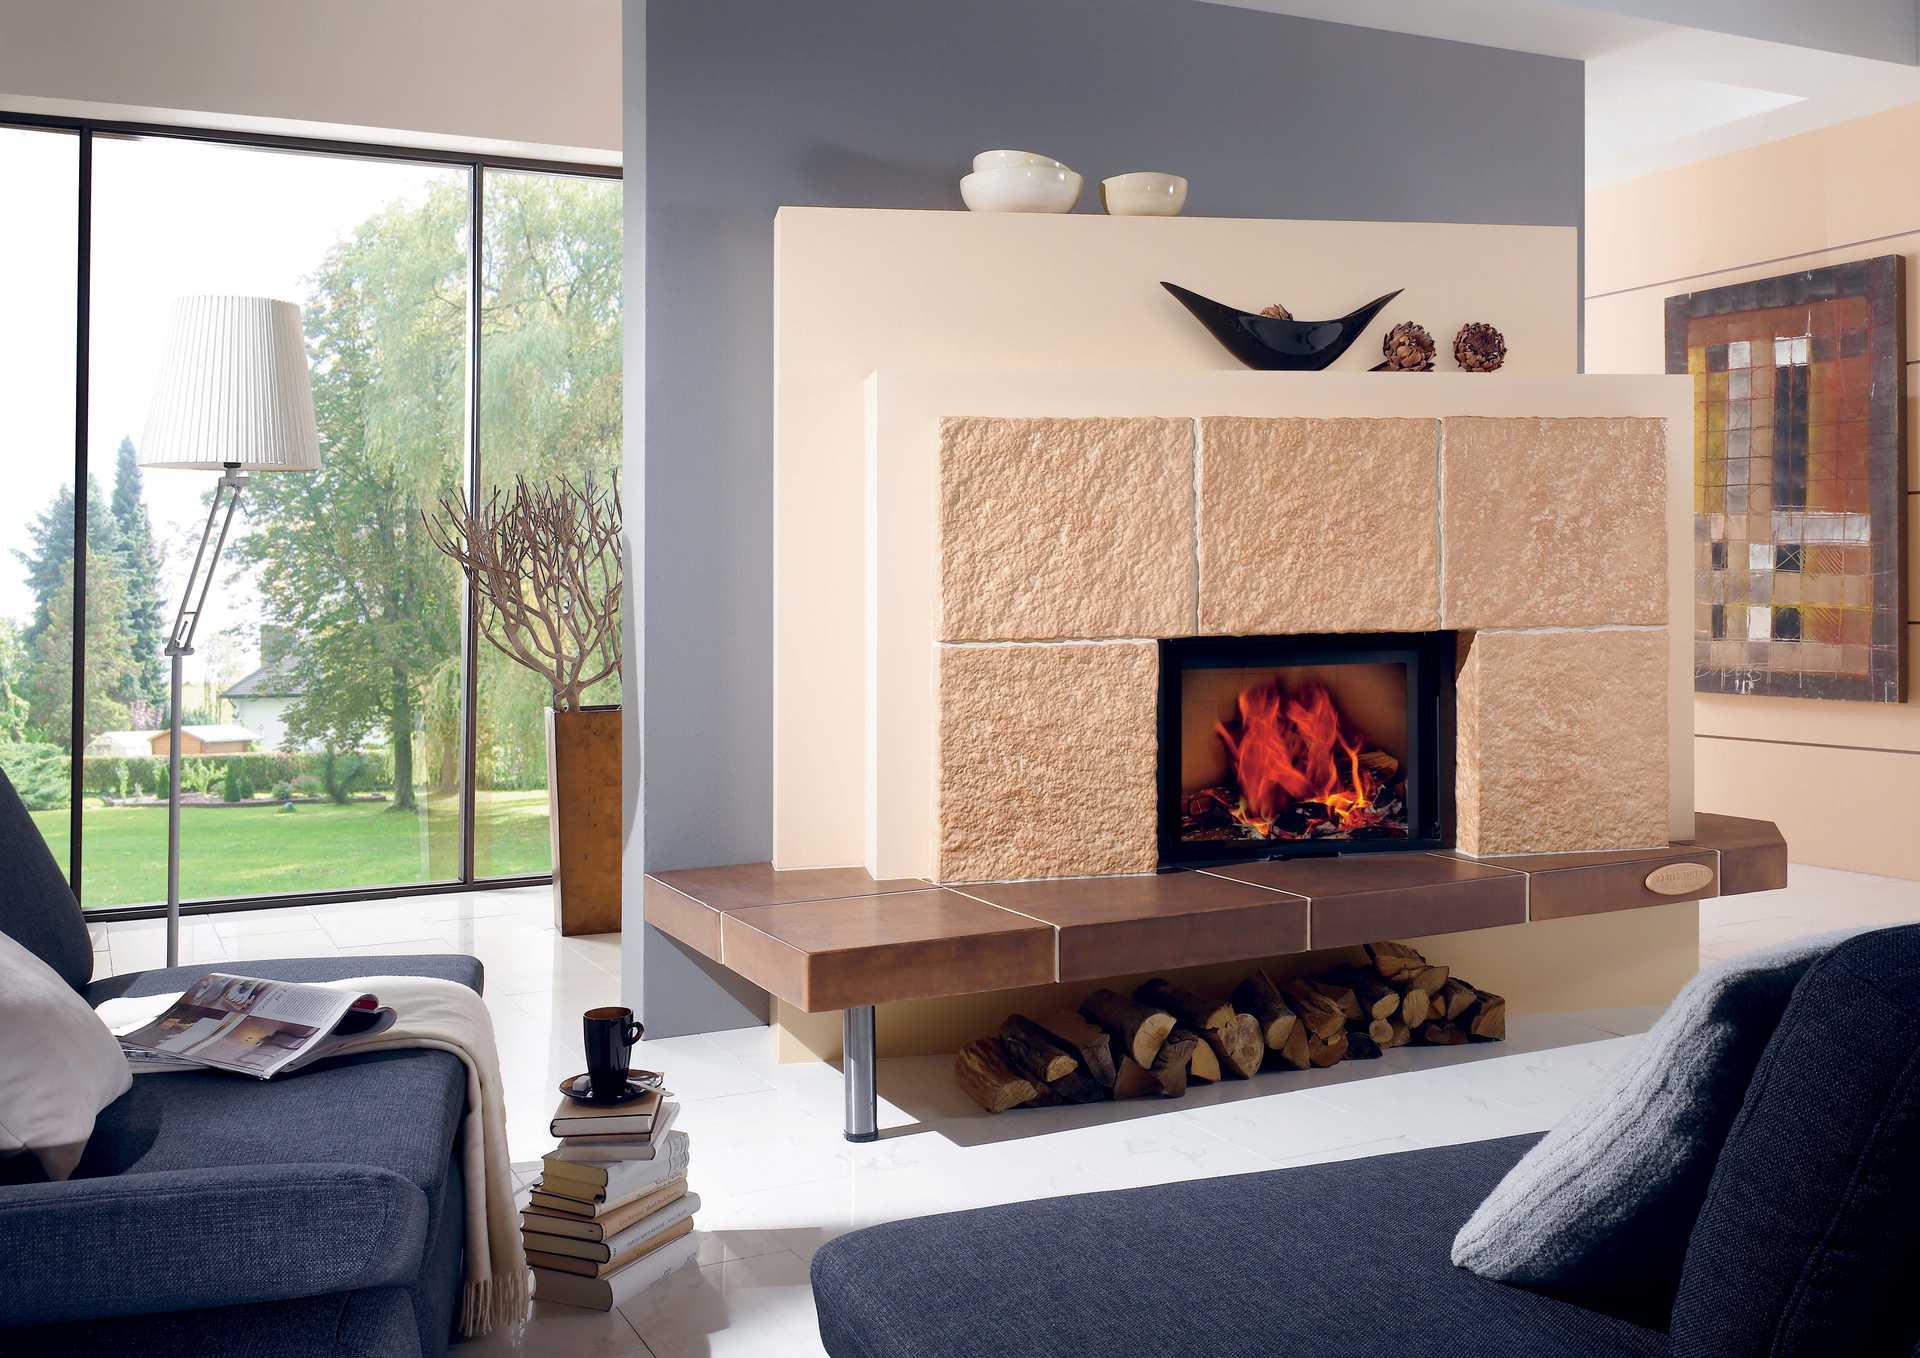 w rme aus holz macht unabh ngig. Black Bedroom Furniture Sets. Home Design Ideas